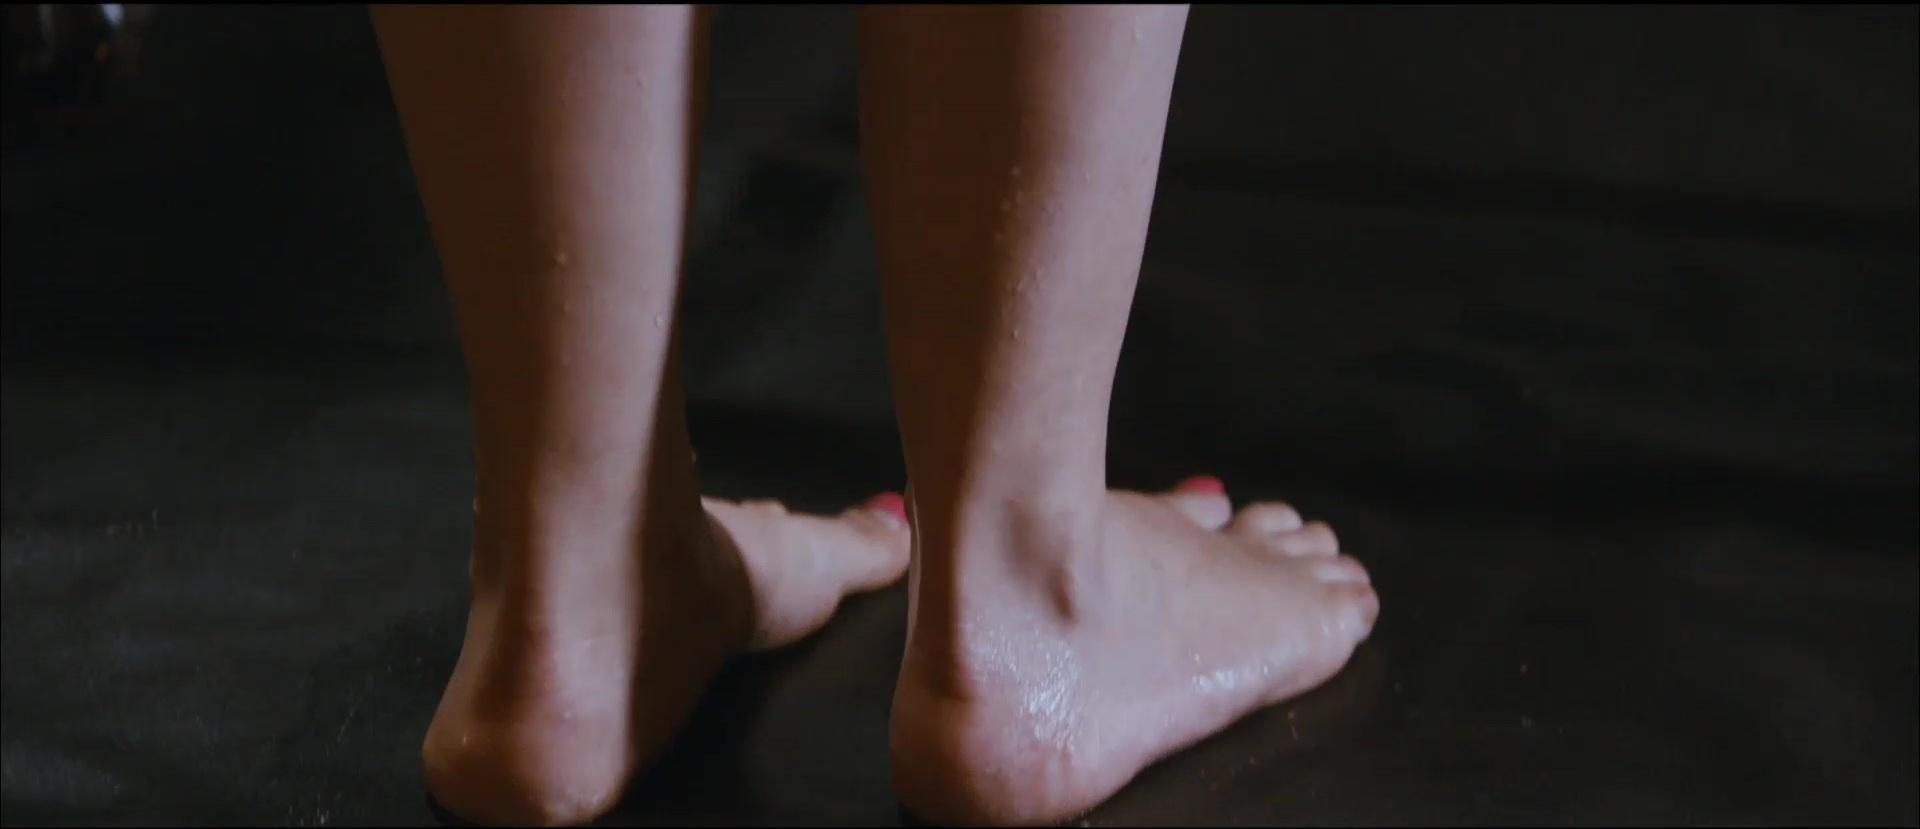 Feet Hanna Rai nude (47 photo), Topless, Paparazzi, Boobs, legs 2017